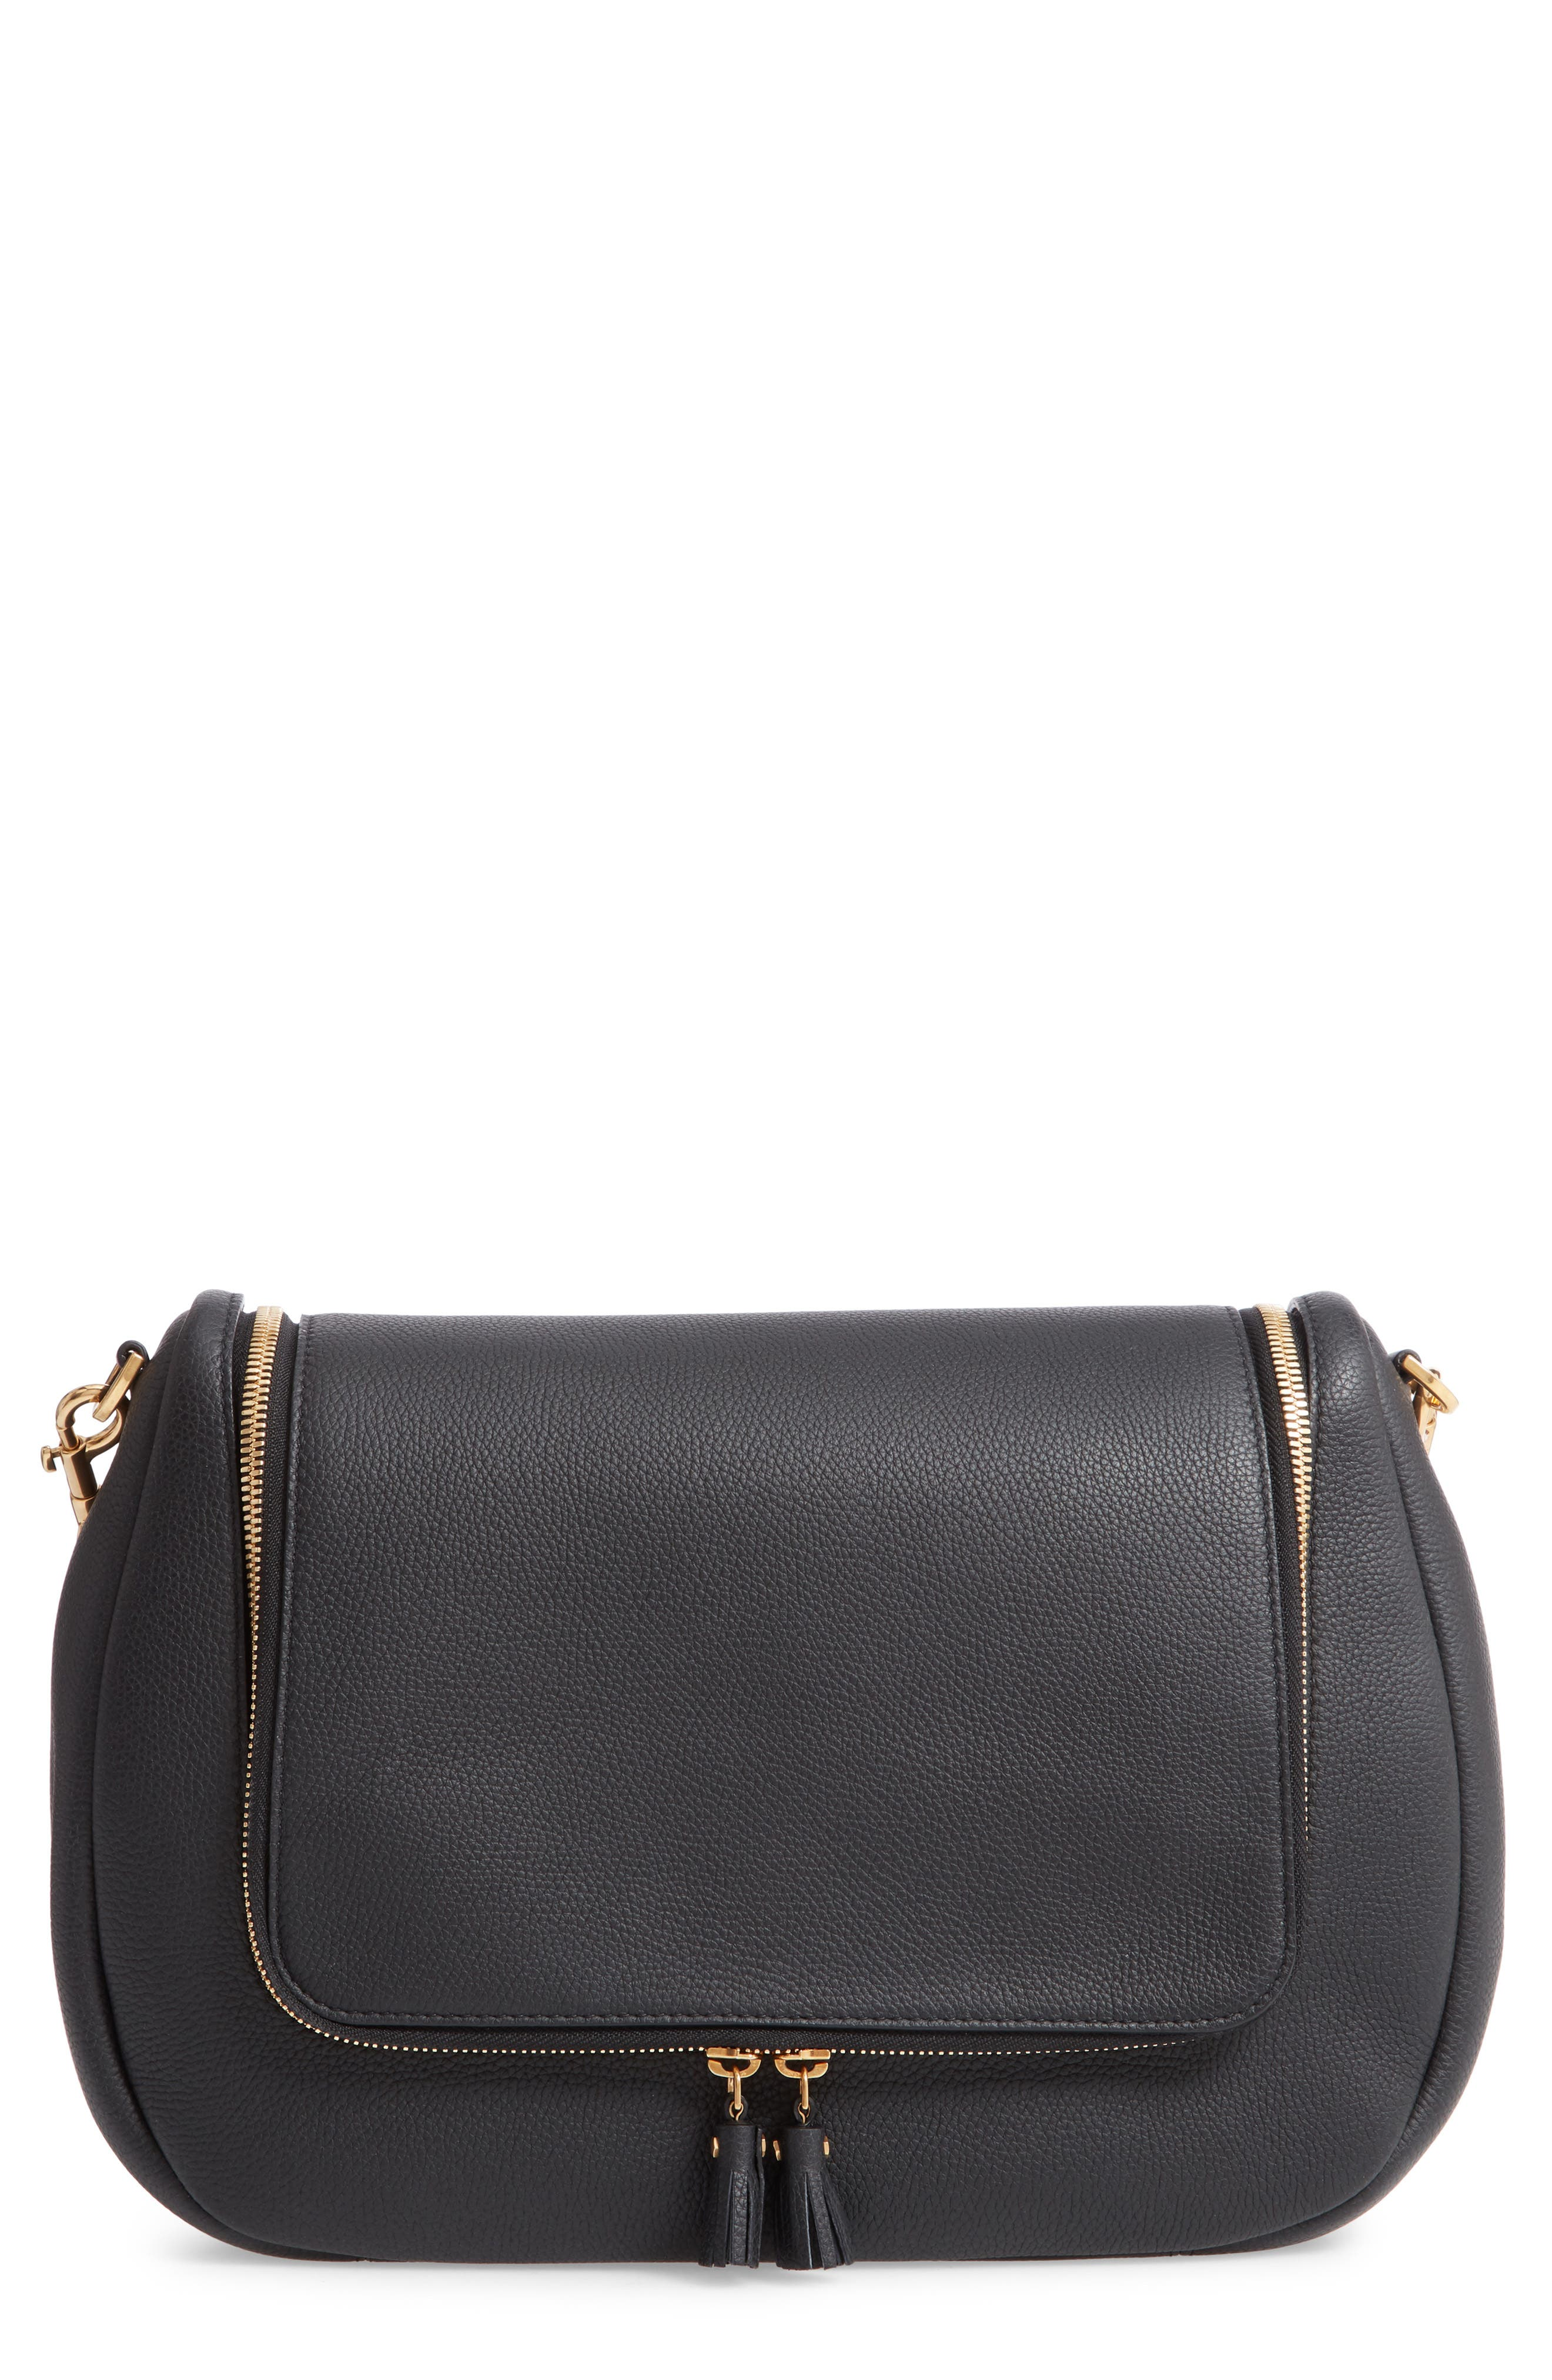 ANYA HINDMARCH   Anya Hindmarch Maxi Vere Soft Satchel Shoulder Bag - Black   Goxip